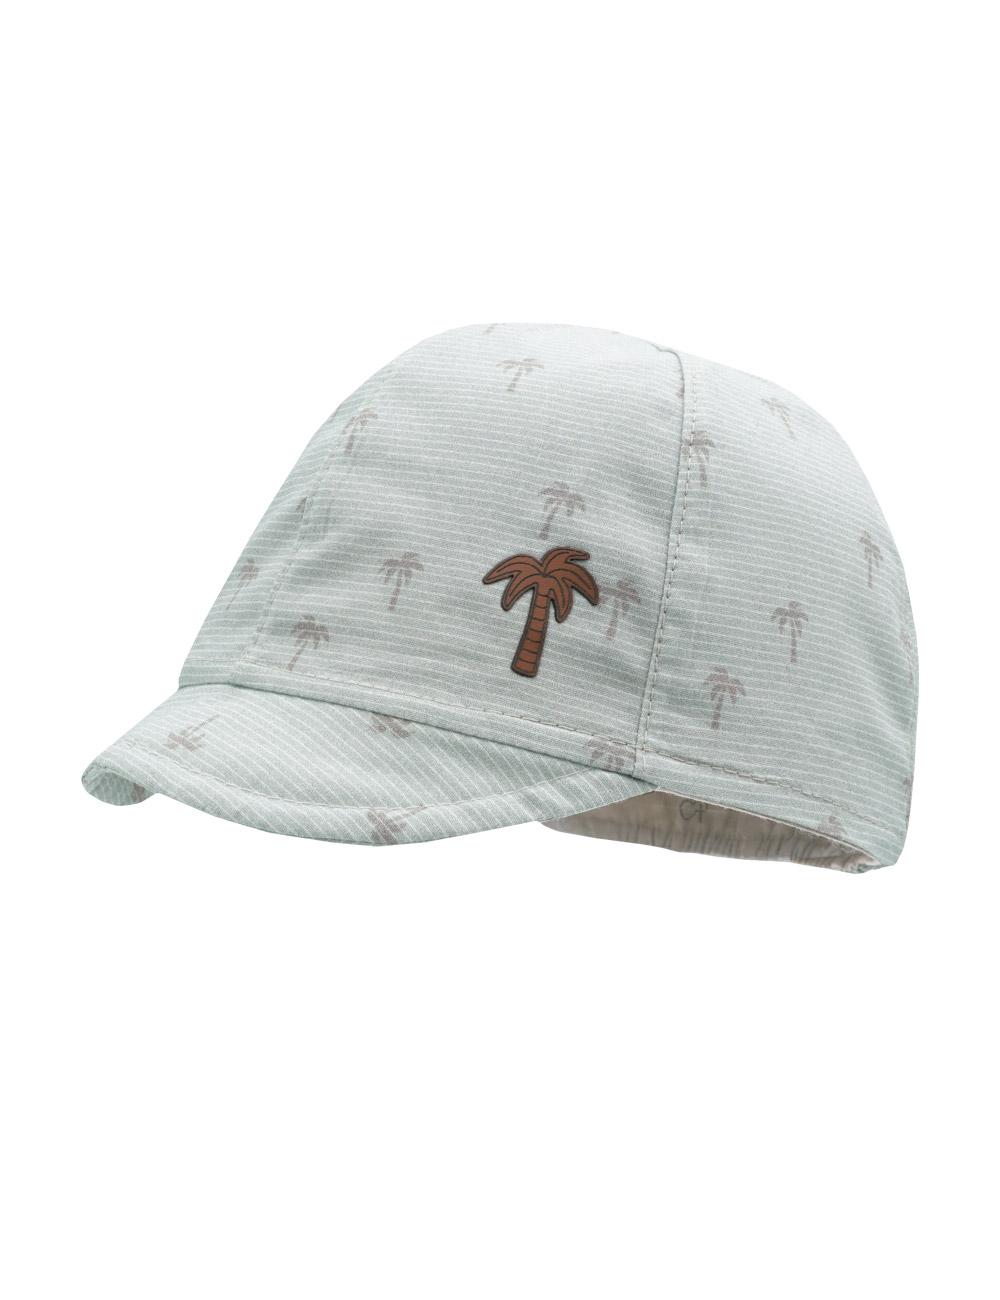 BOY-Cap Palmen 45 Maximo. Farbe: nebelgrau-lamm-palme, Größe: 45